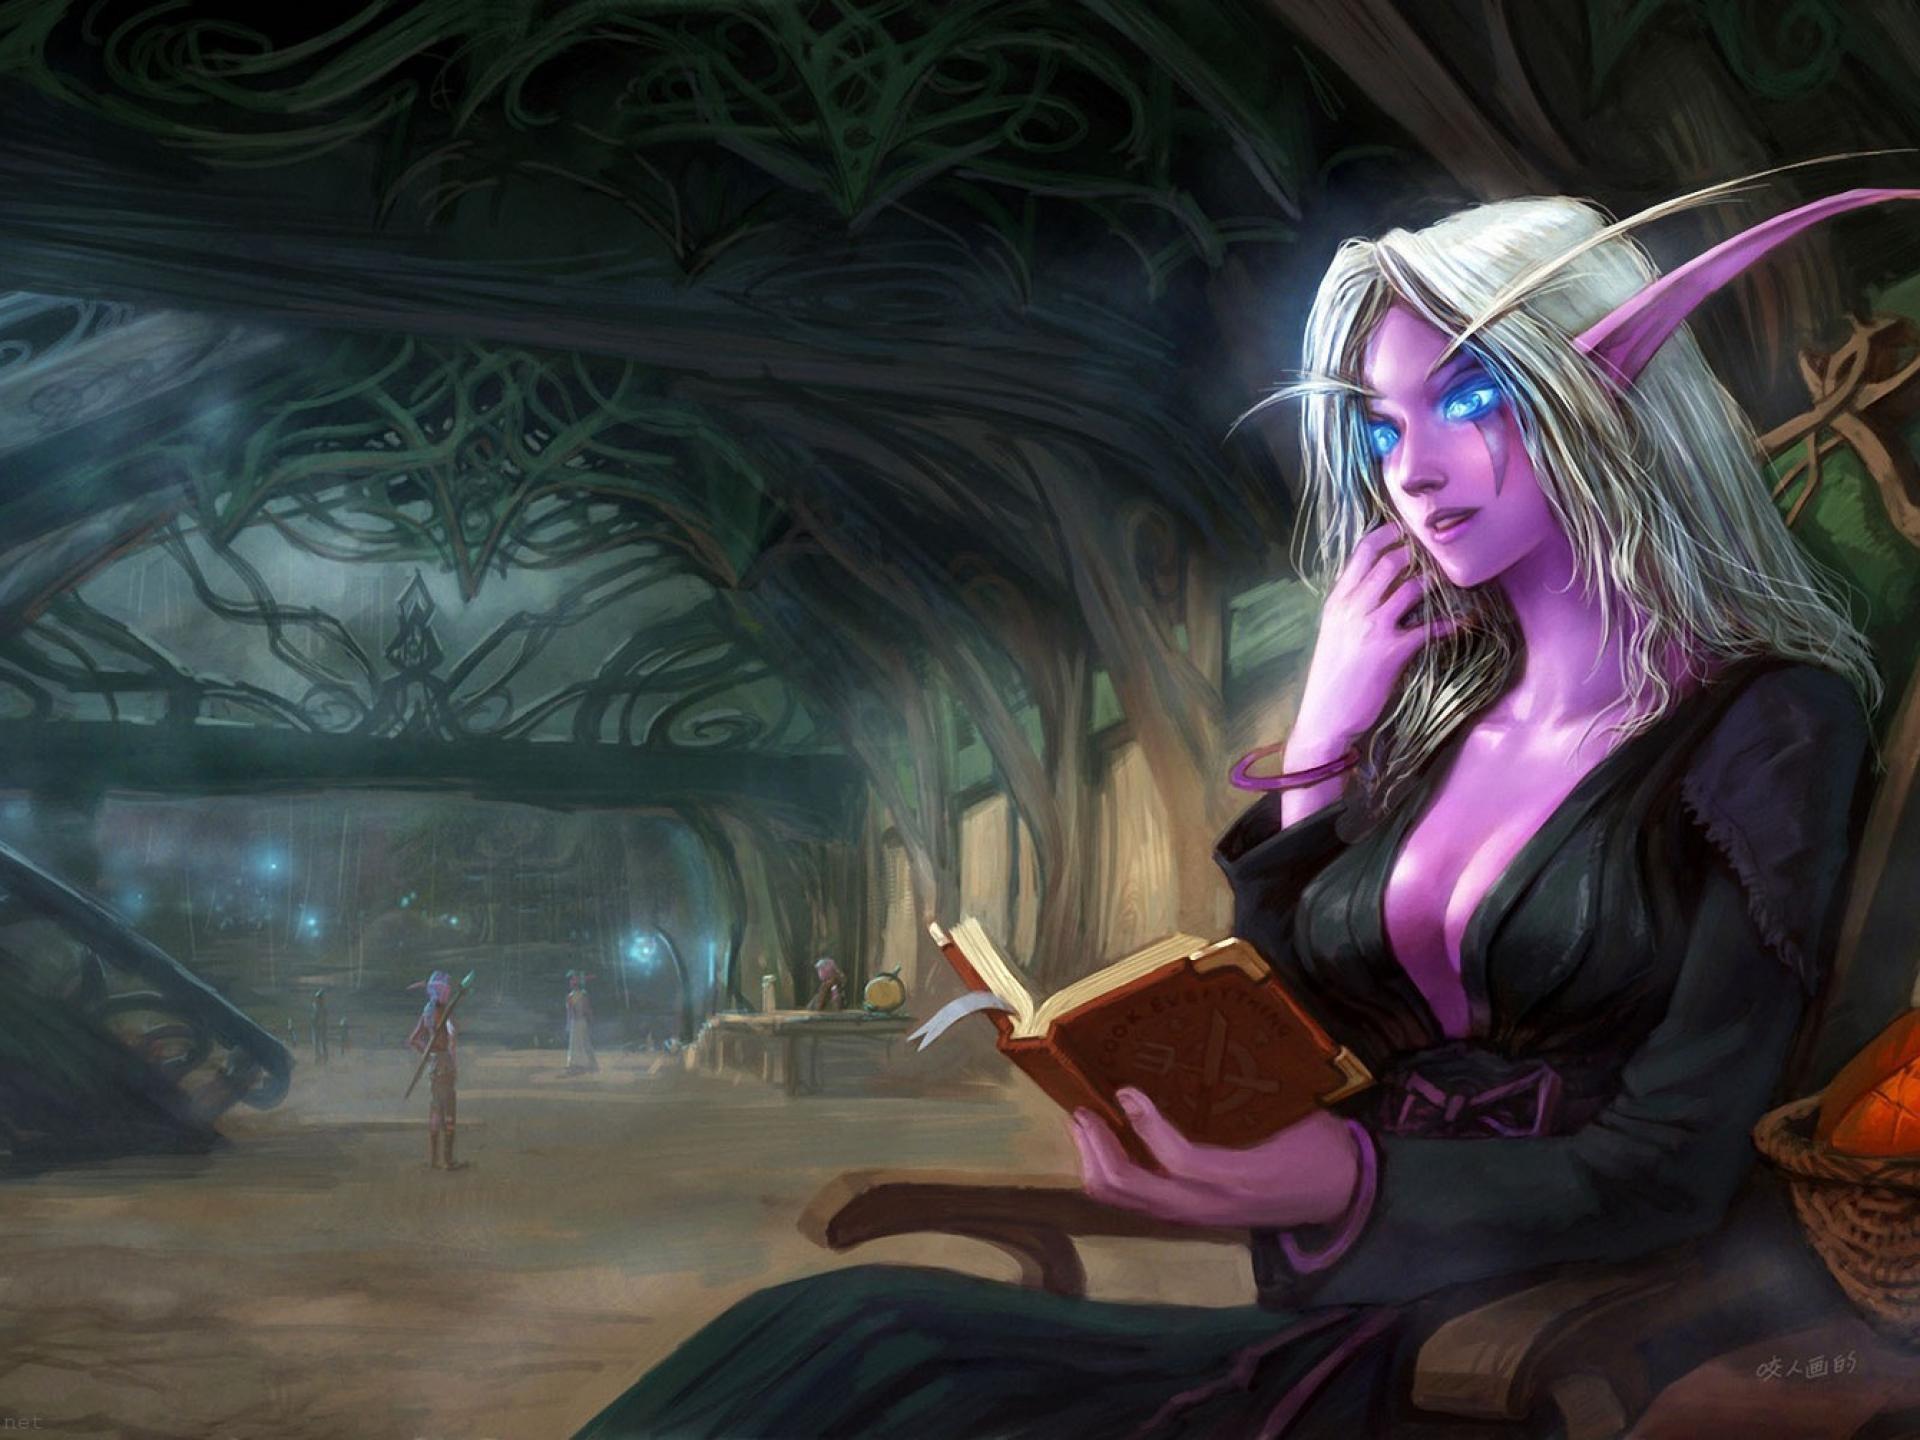 Nightelf Art Yao Ren World Of Warcraft Night Elf Reading Room Fantasy Close  Wallpapers Resolution : Filesize : kB, Added on January Tagged : nightelf